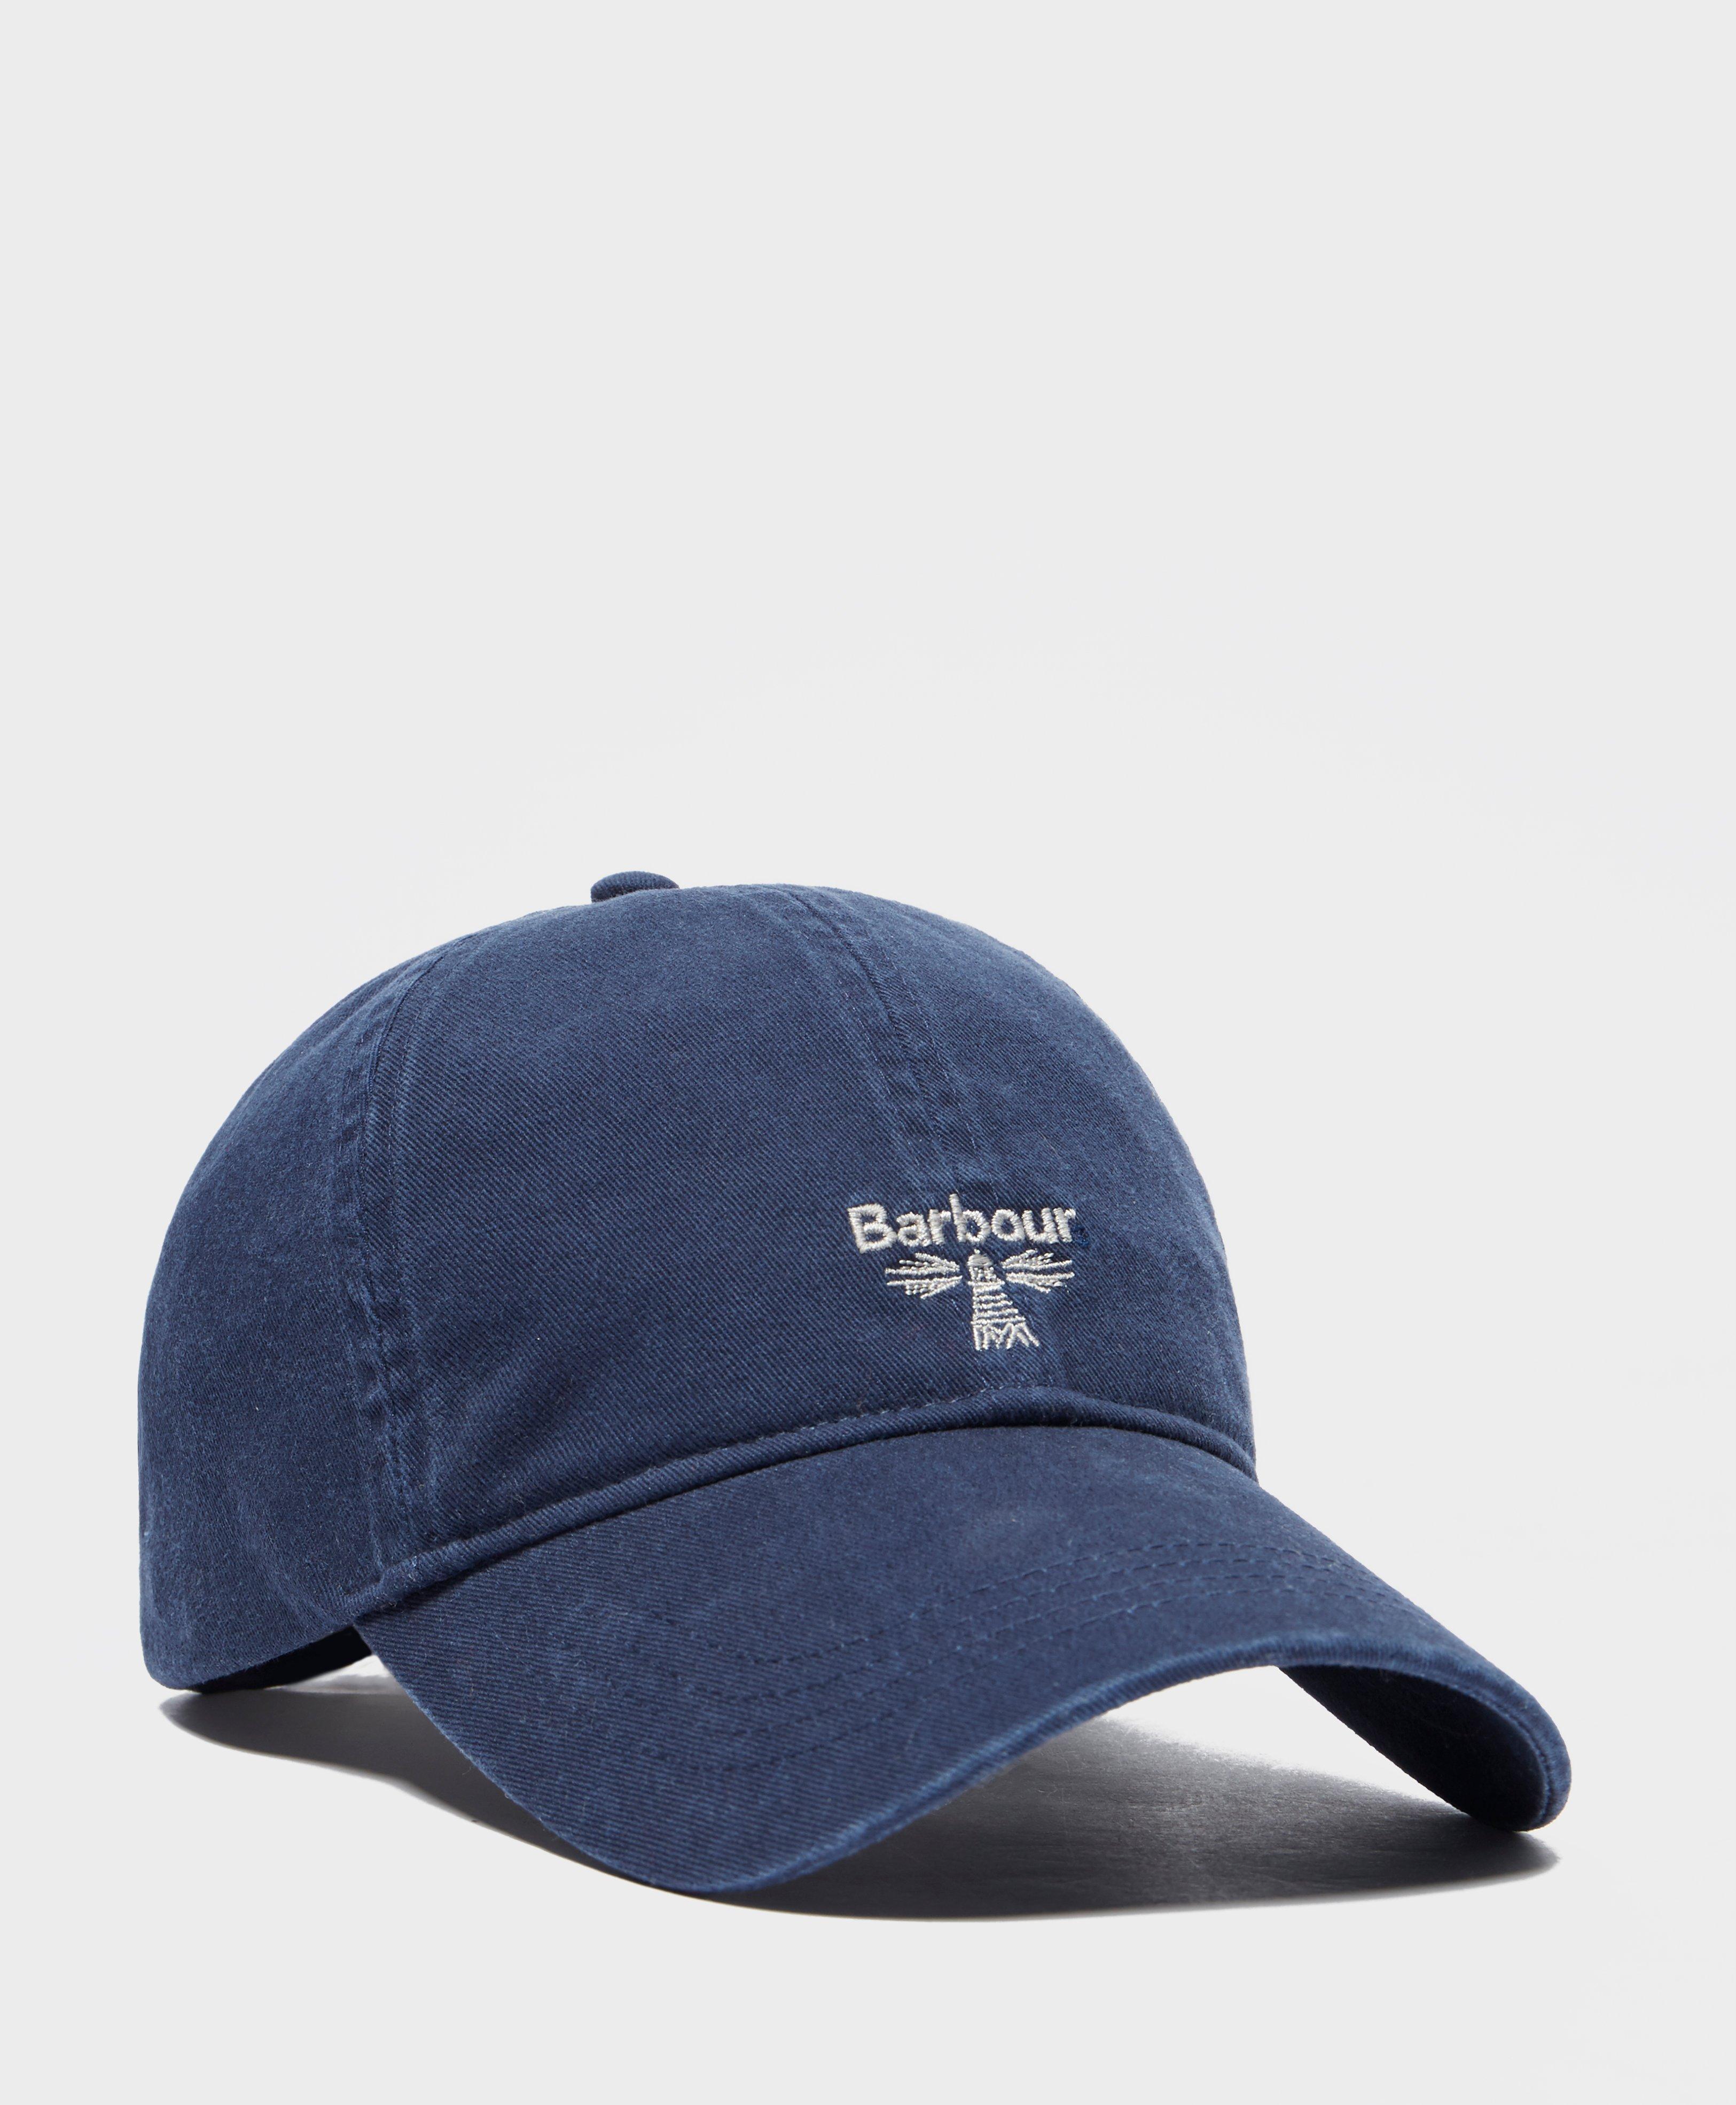 Barbour - Blue Beacon Cap for Men - Lyst. View fullscreen 3713b89ffd00